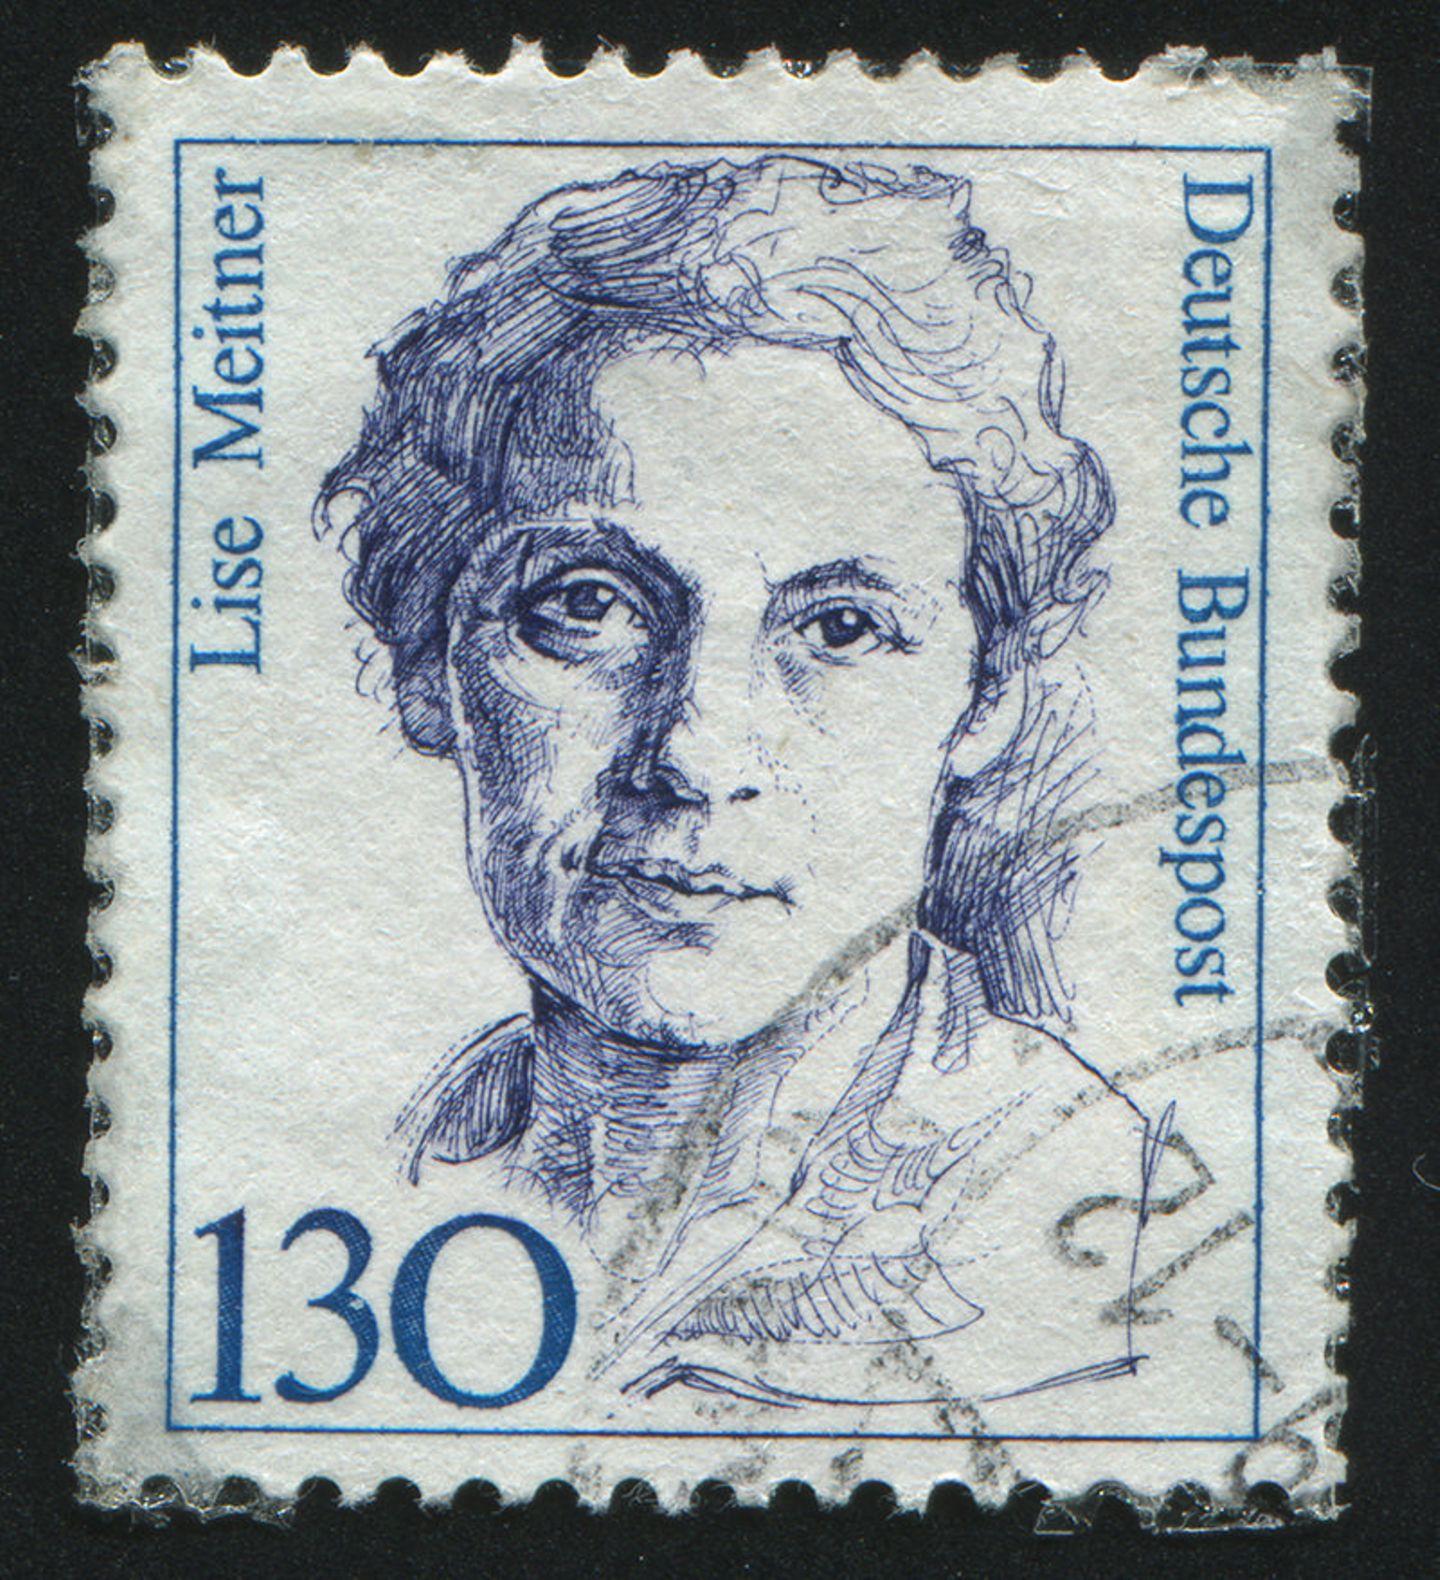 Briefmarke mit dem Bild Lise Meitners